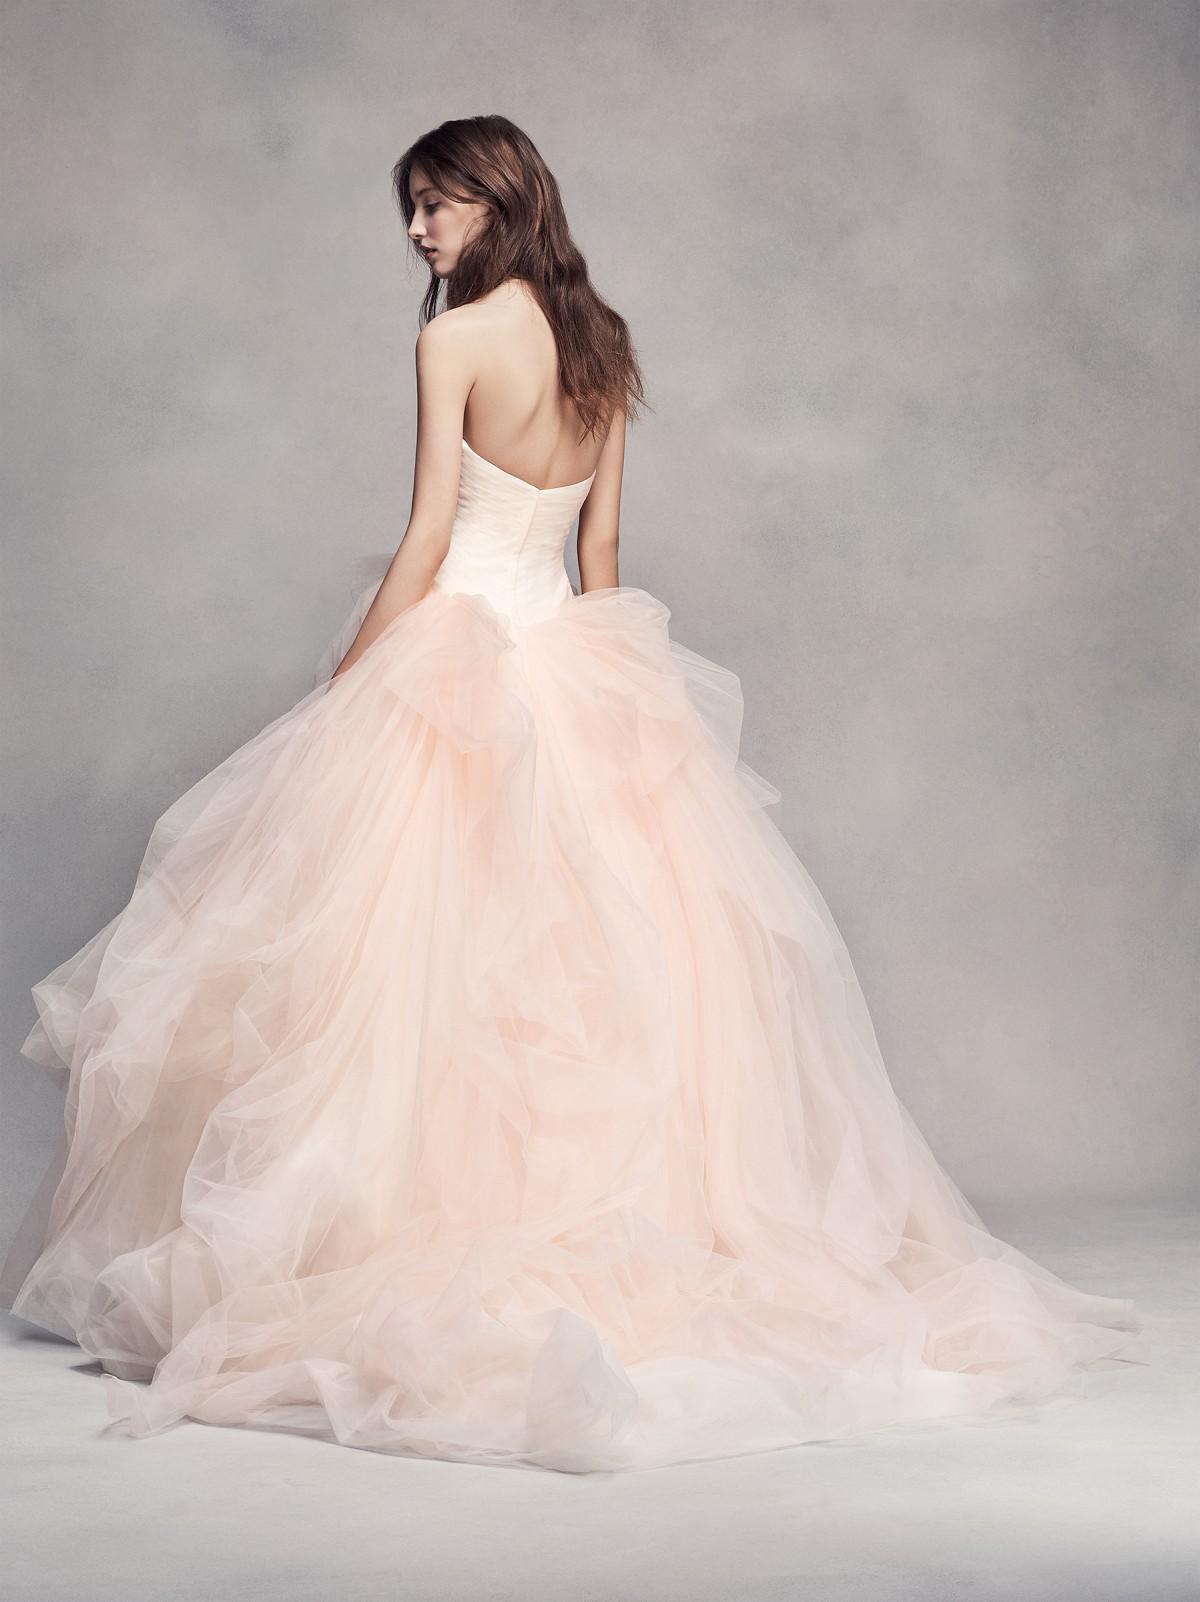 Affordable wedding dresses by David's Bridal